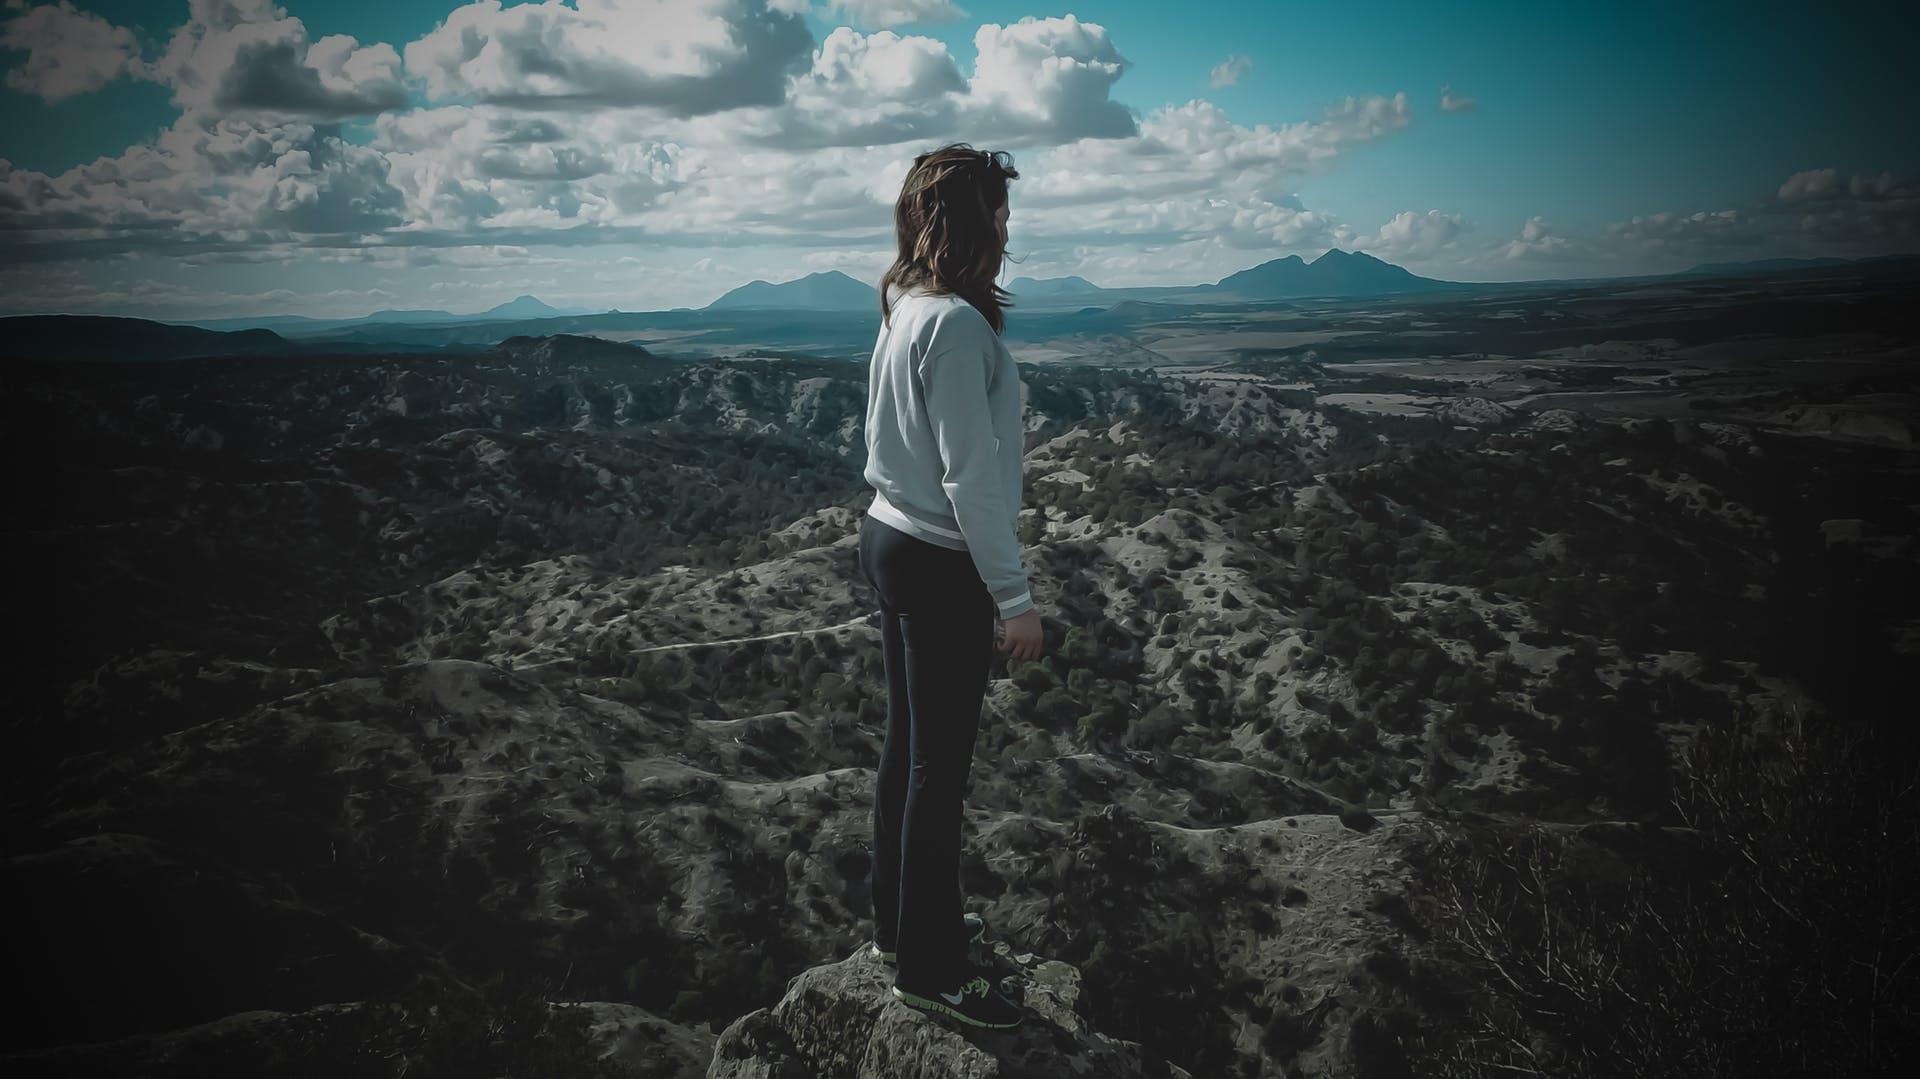 scenic girl sunset rock adventure solitude high person hike mountain climbing